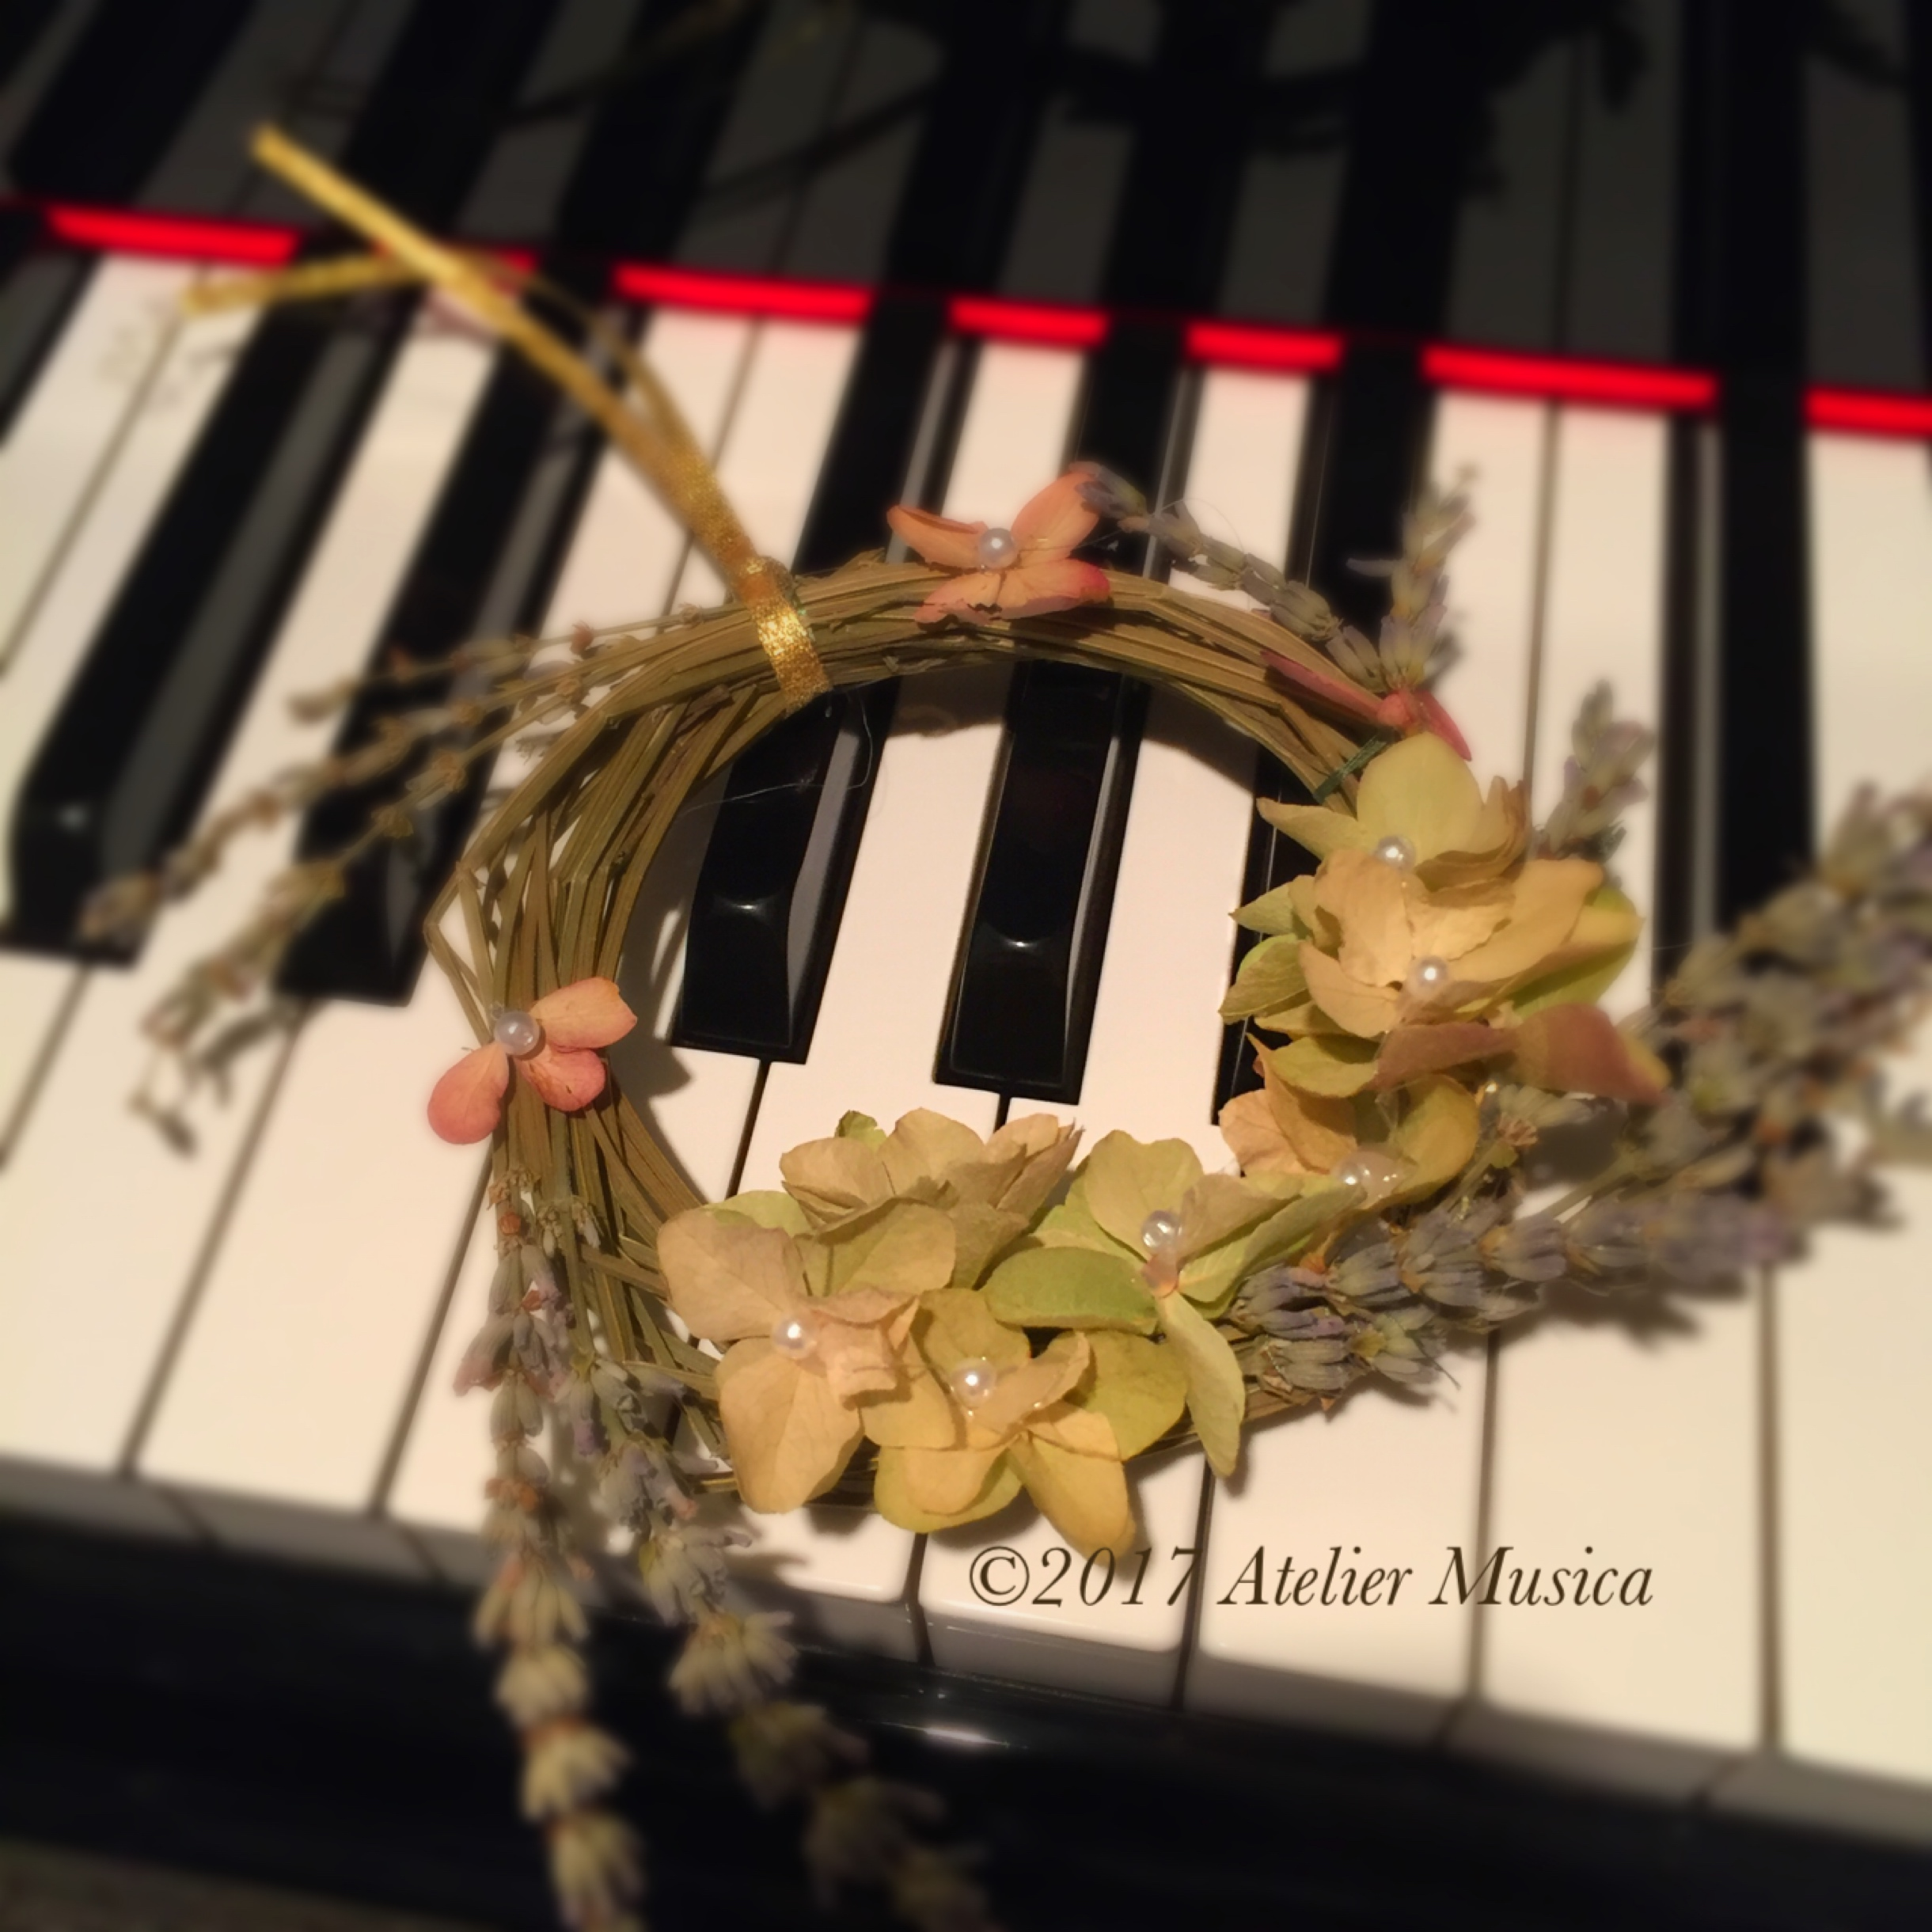 Atelier Musica オンラインショップ -Operetta-